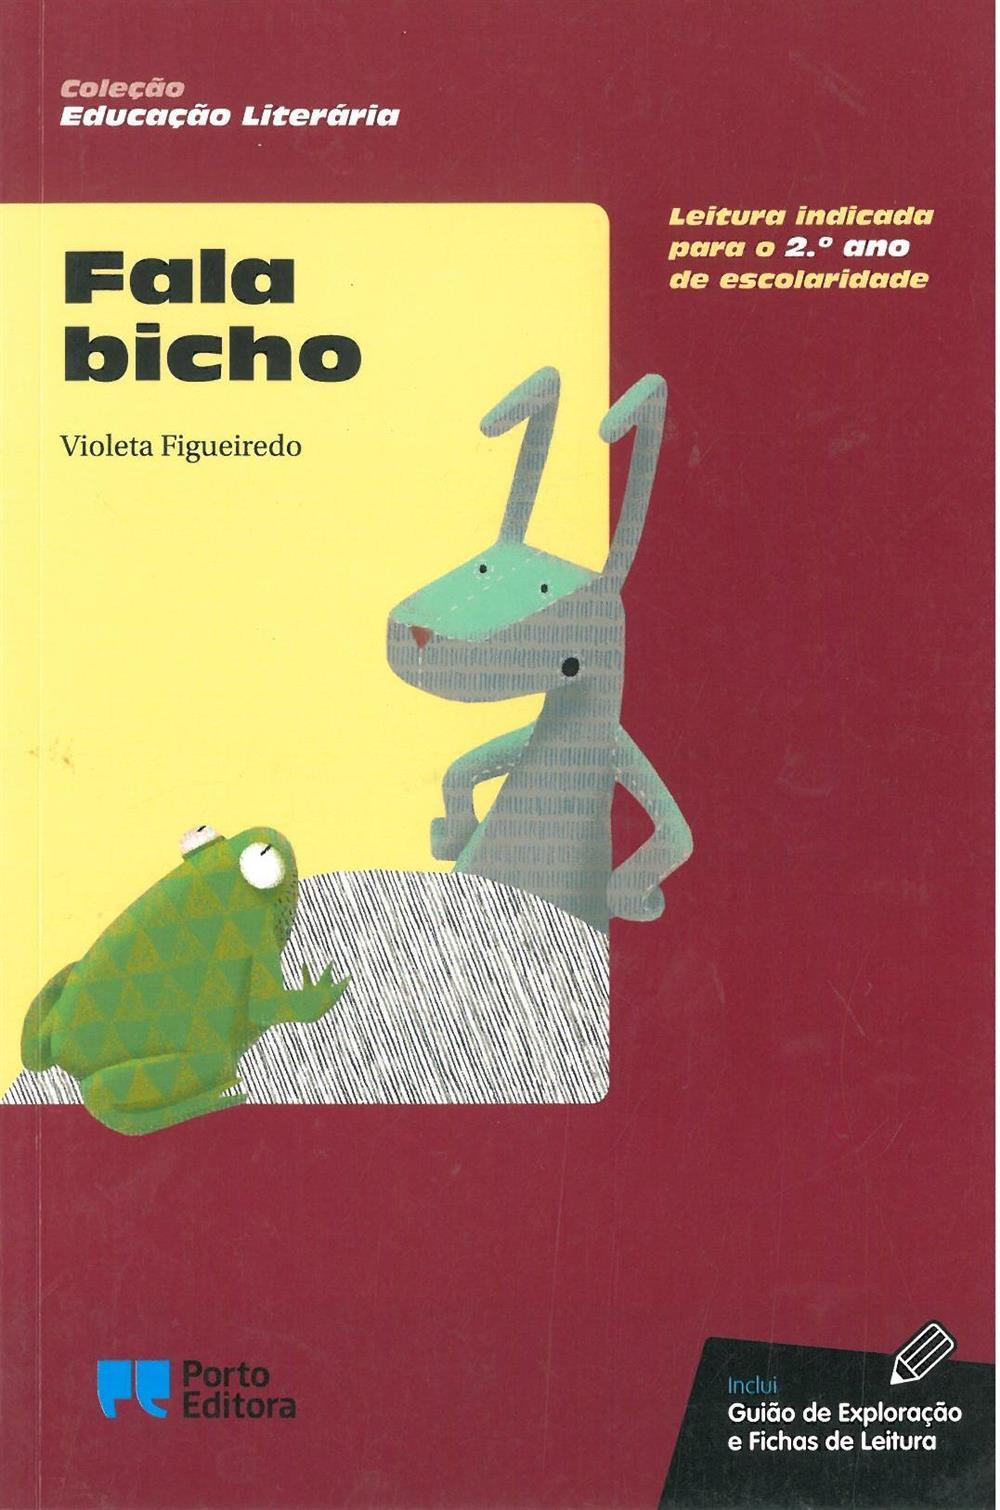 Fala bicho_.jpg